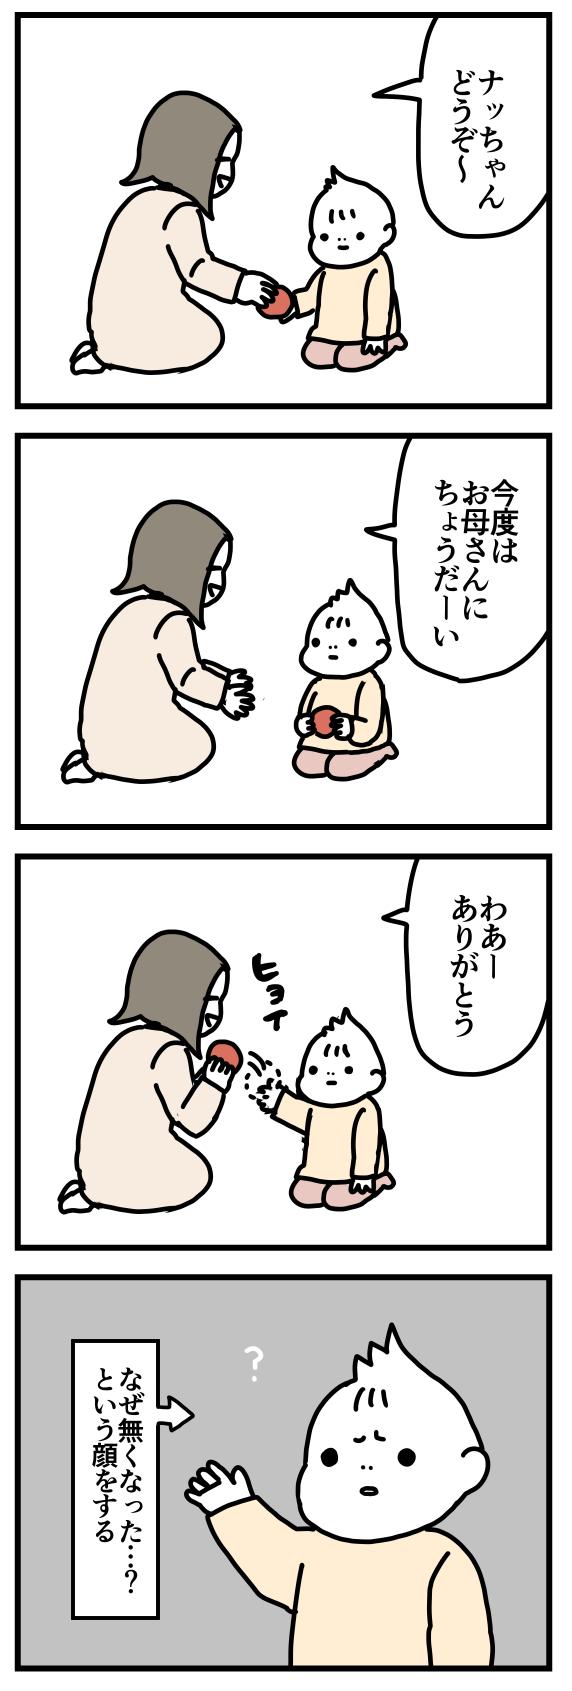 f:id:kanemotonomukuu:20171103210501j:plain